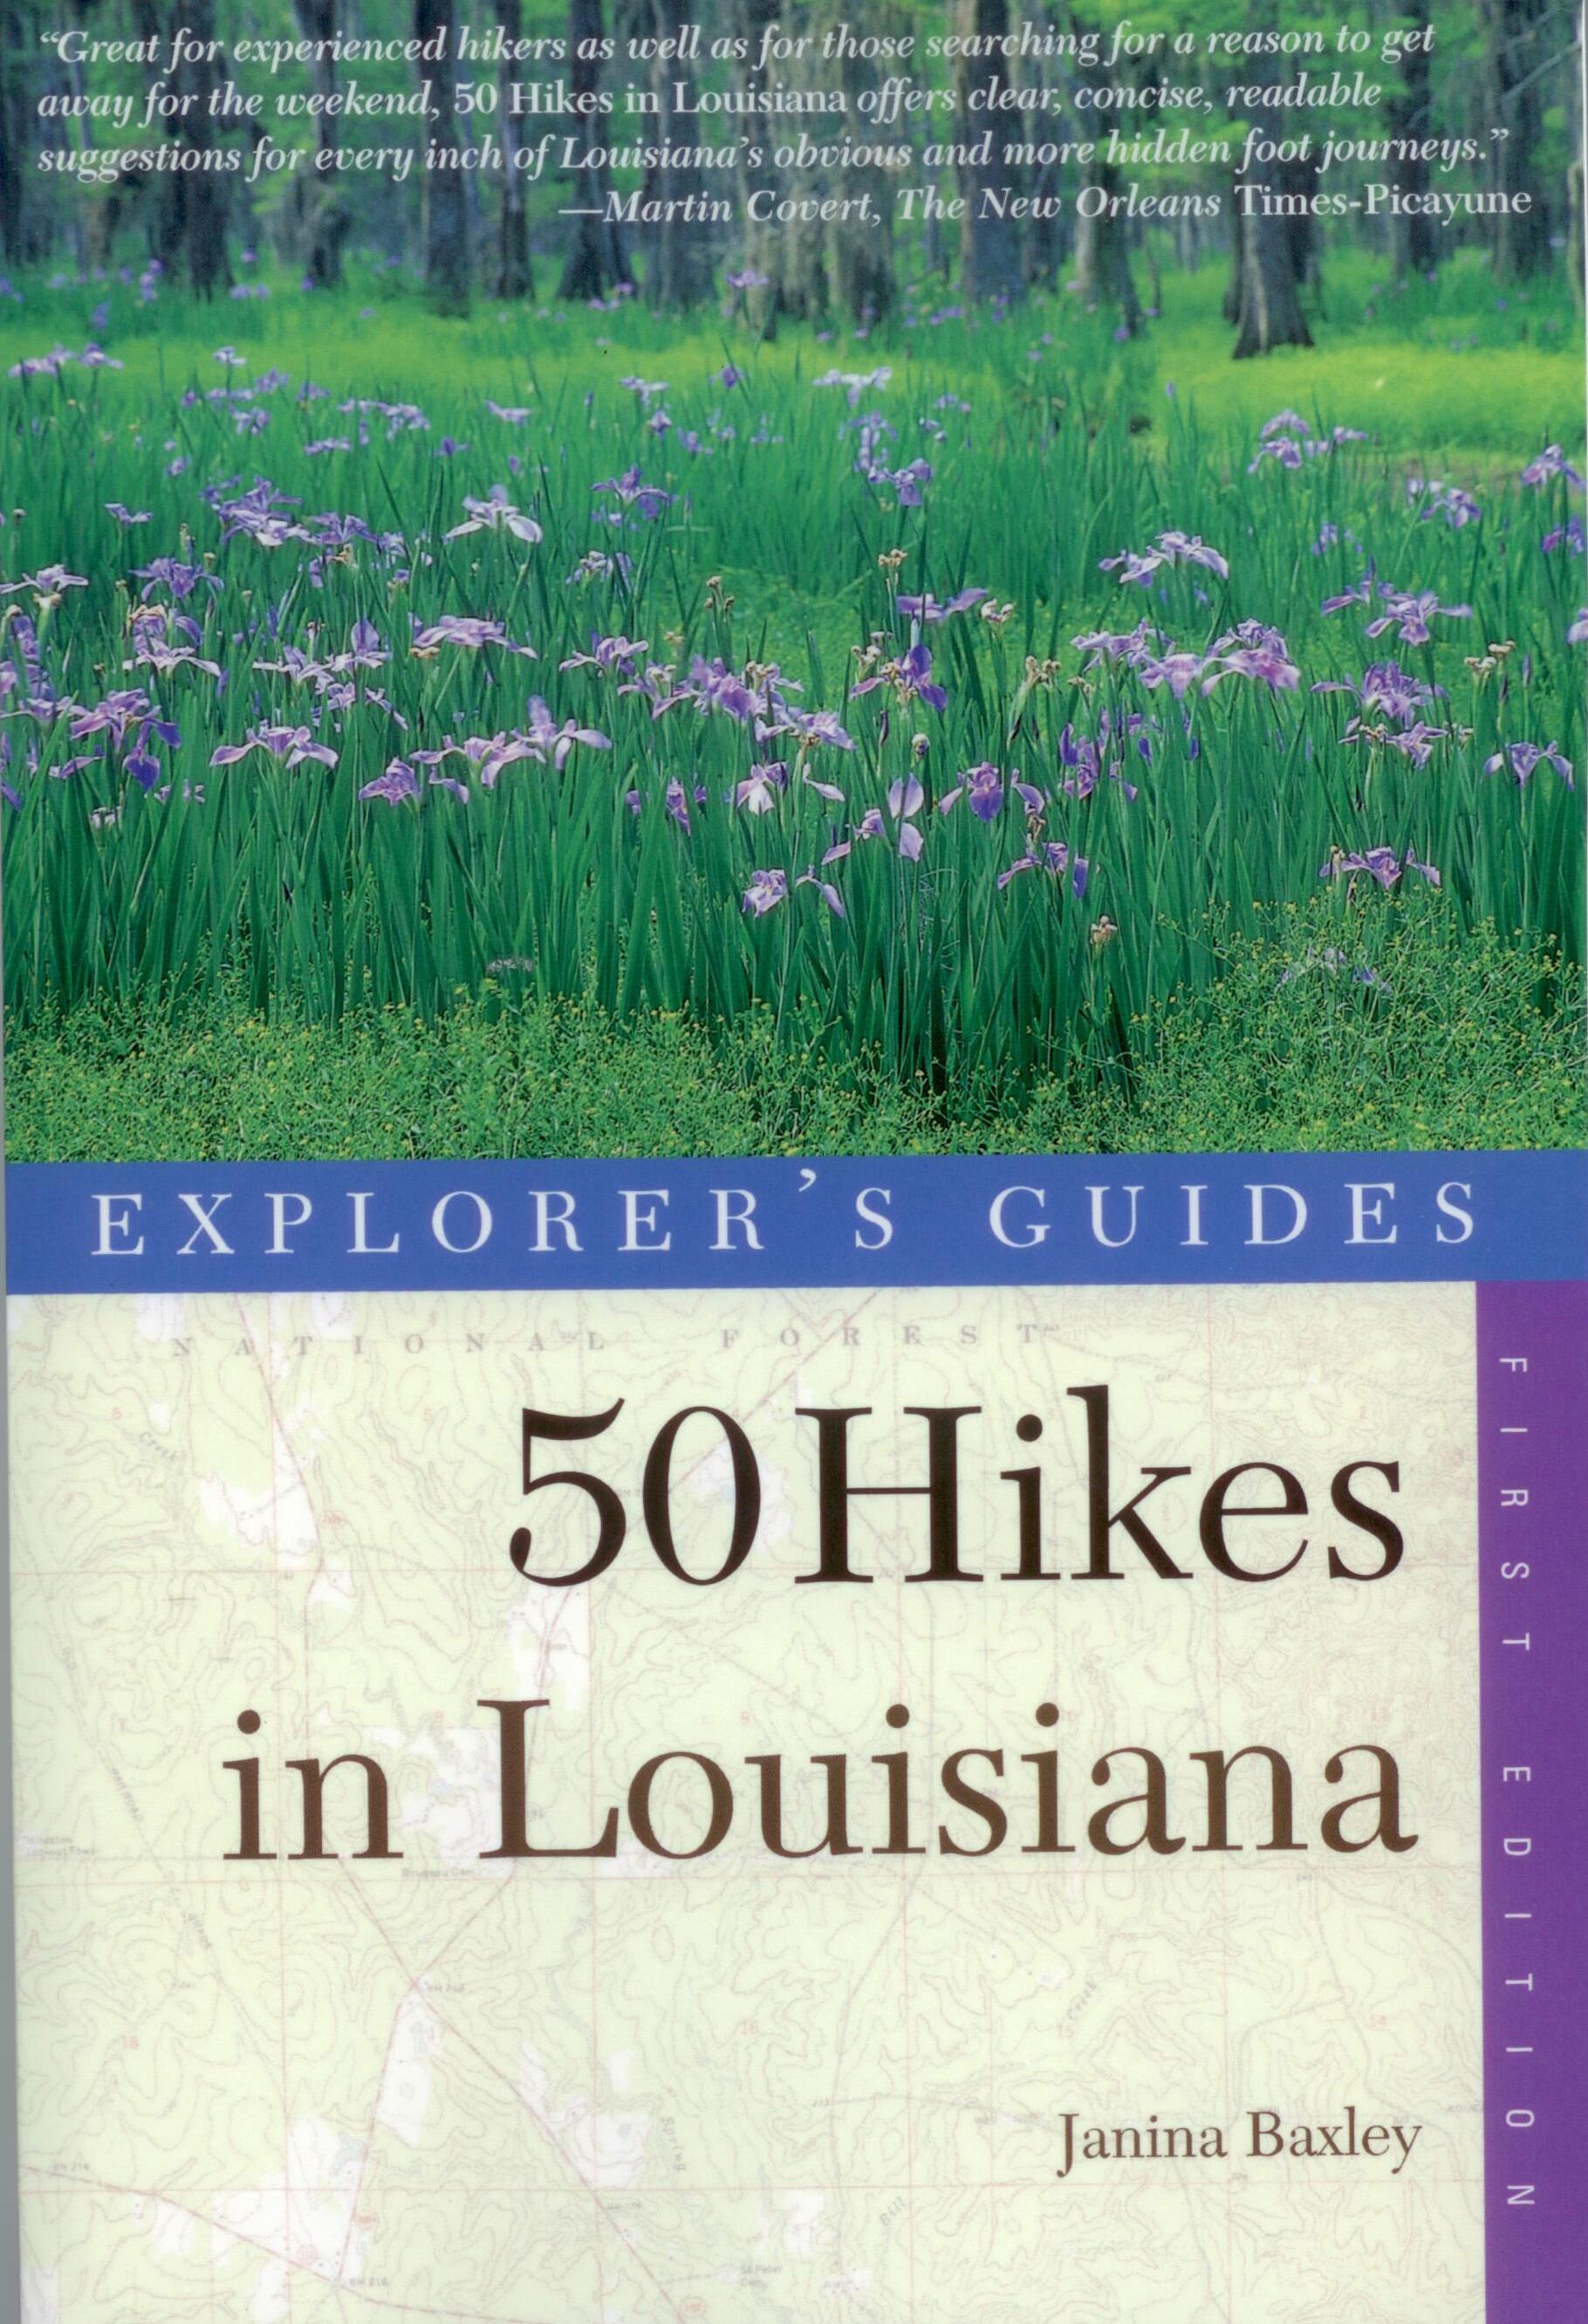 6 Hiking Destinations Near New Orleans